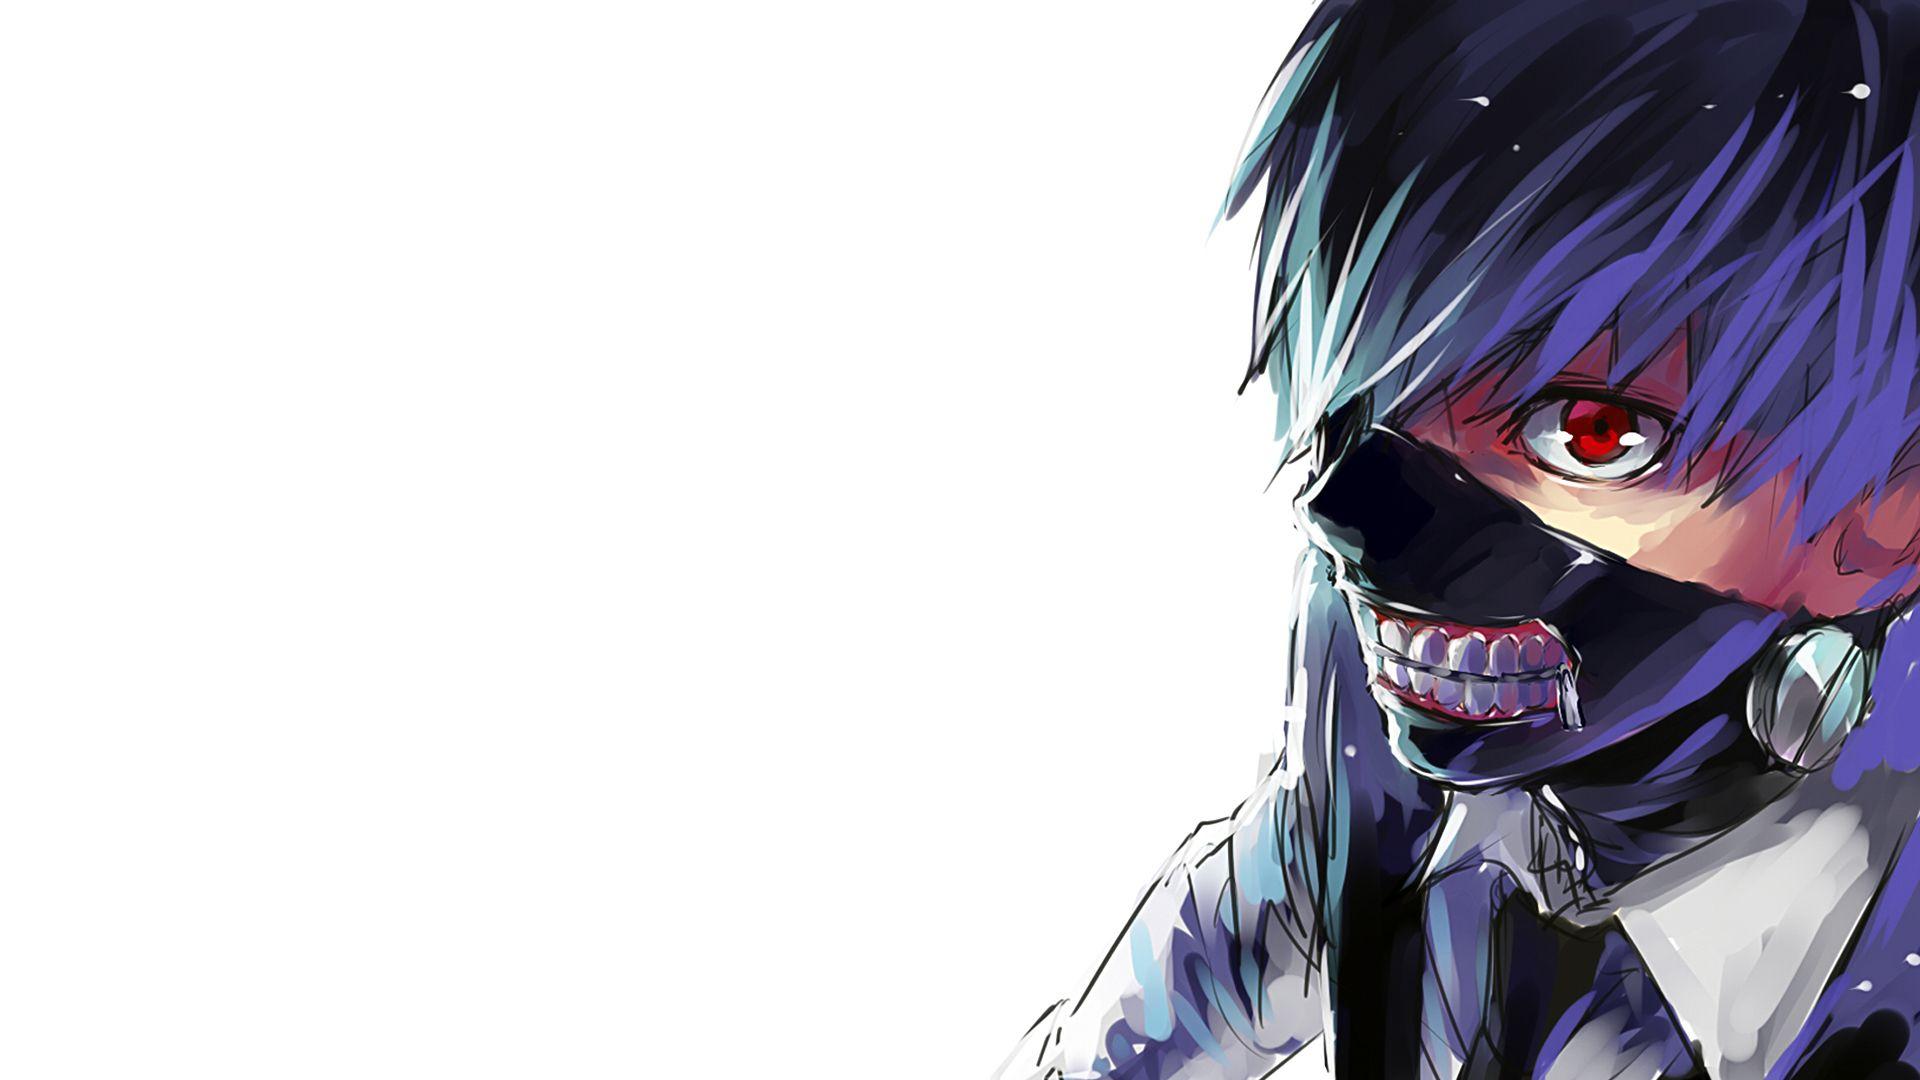 Tokyo Ghoul Wallpapers HD Gambar anime, Jepang tokyo, Gambar